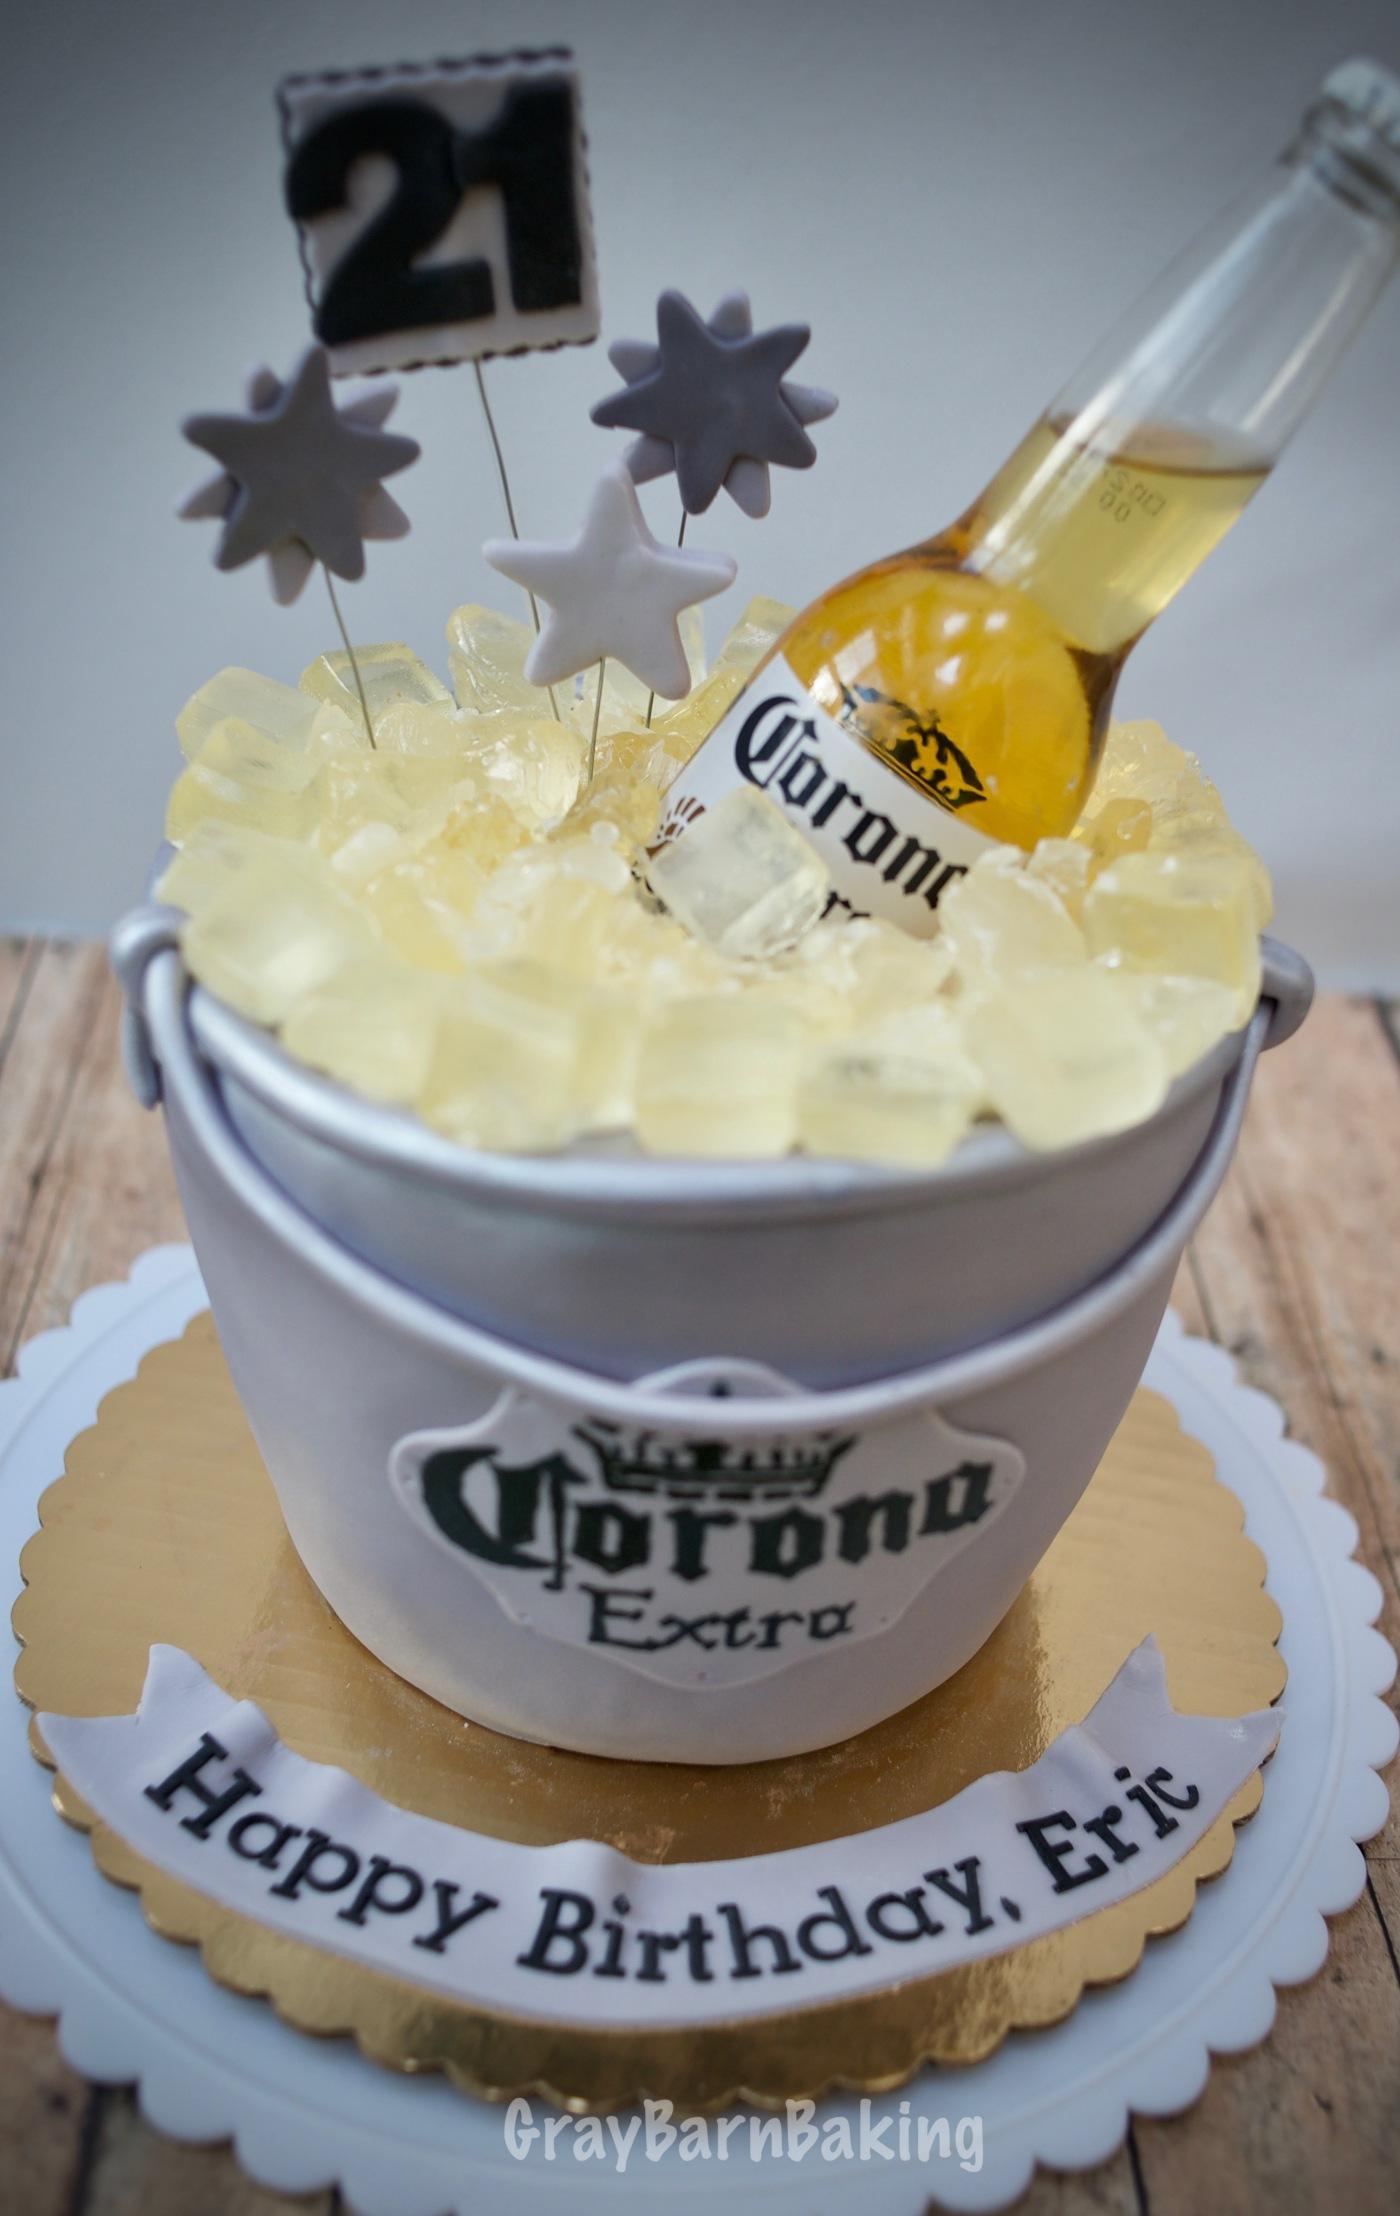 corona beer birthday cake images